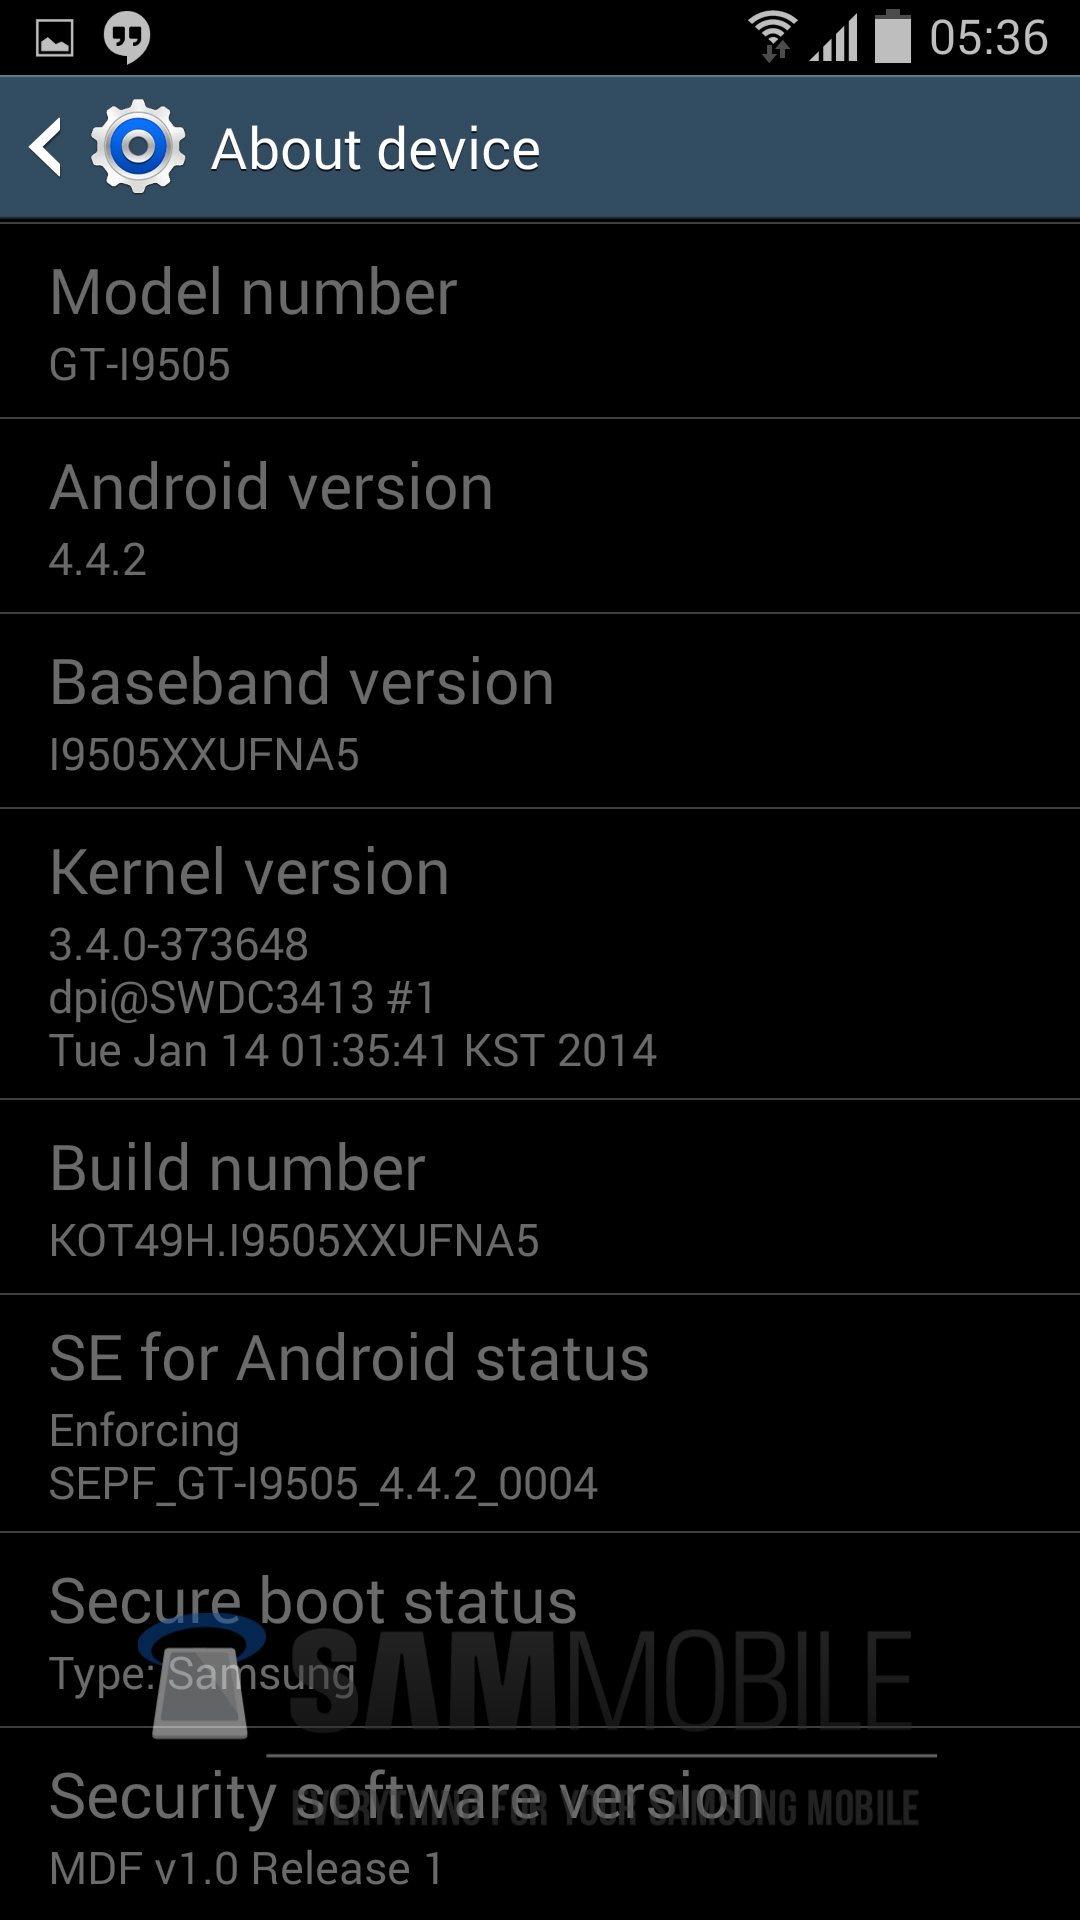 Android_KitKat_4.4.2_Galaxy_S4 (1)